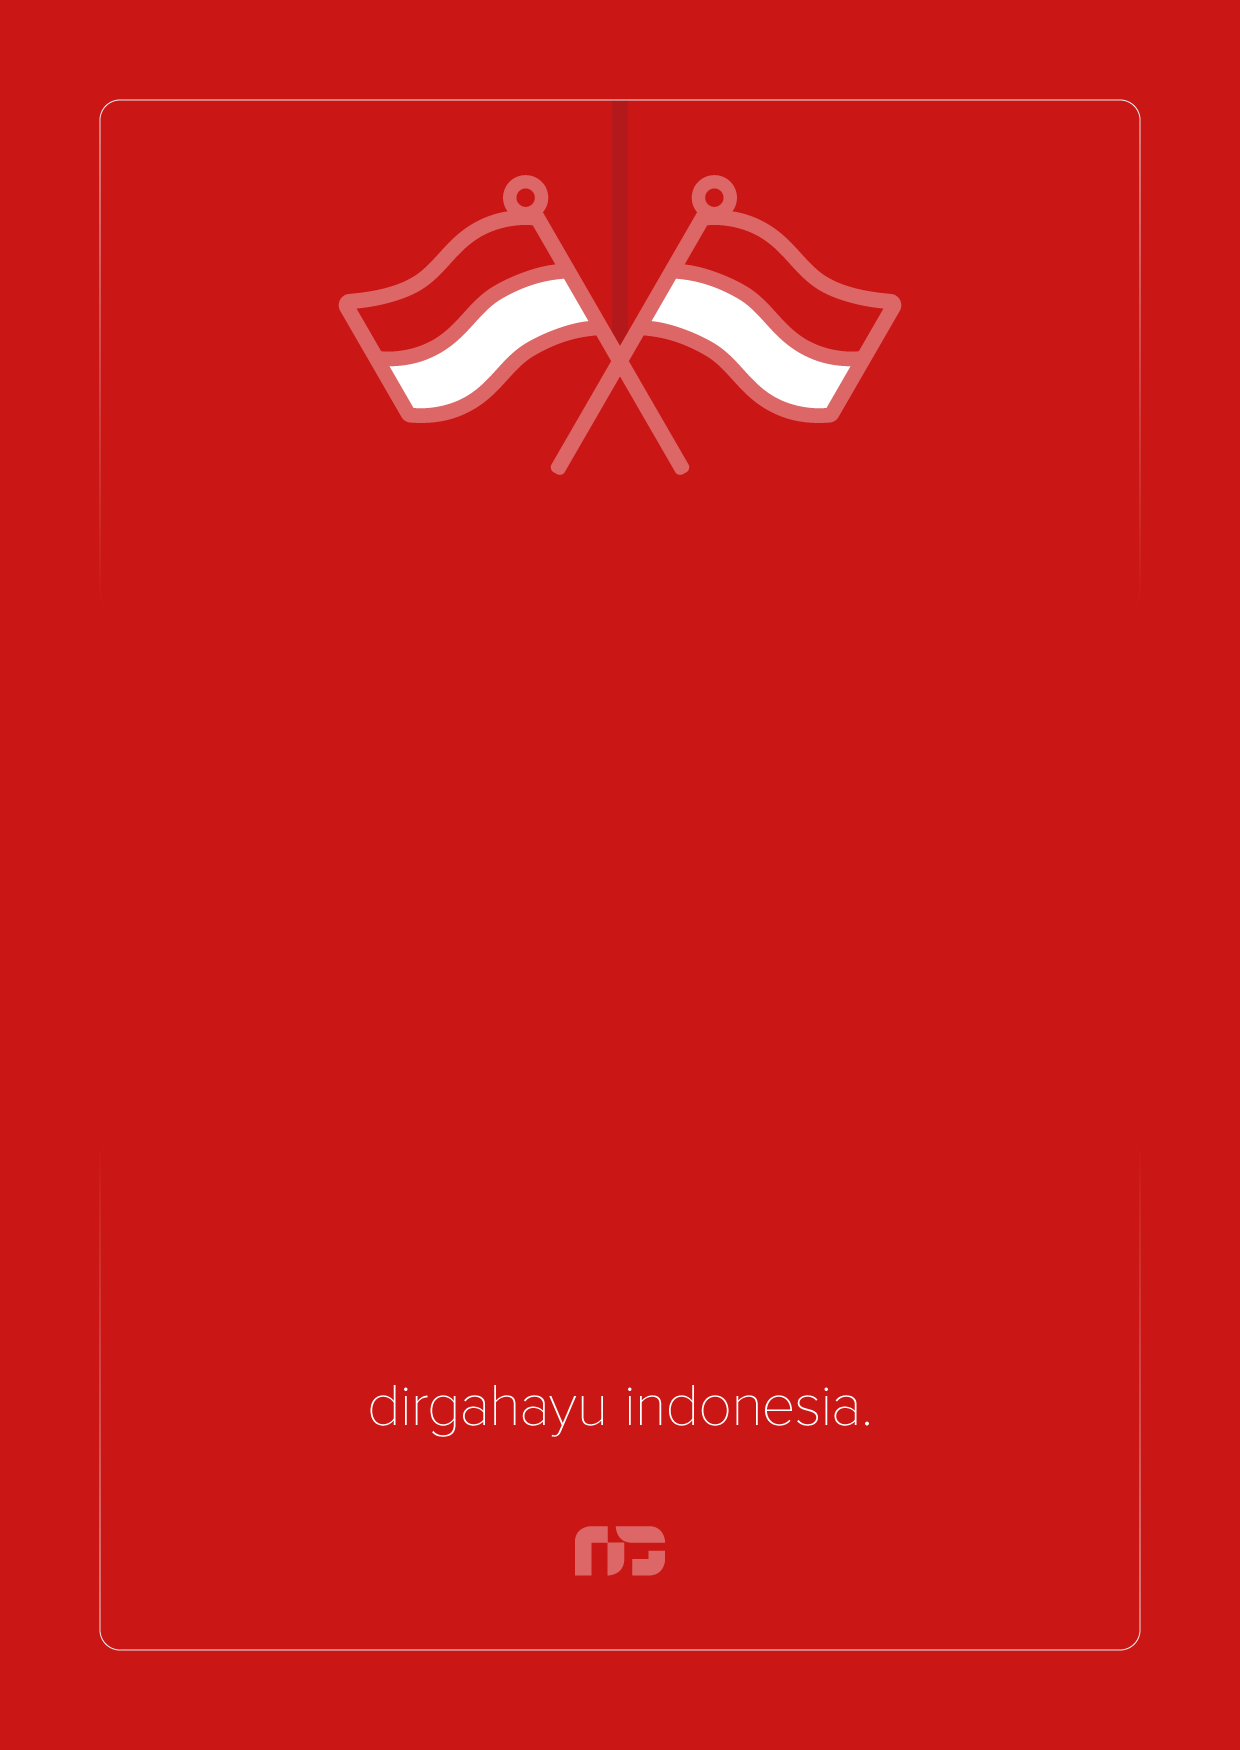 Dirgahayu, Indonesia